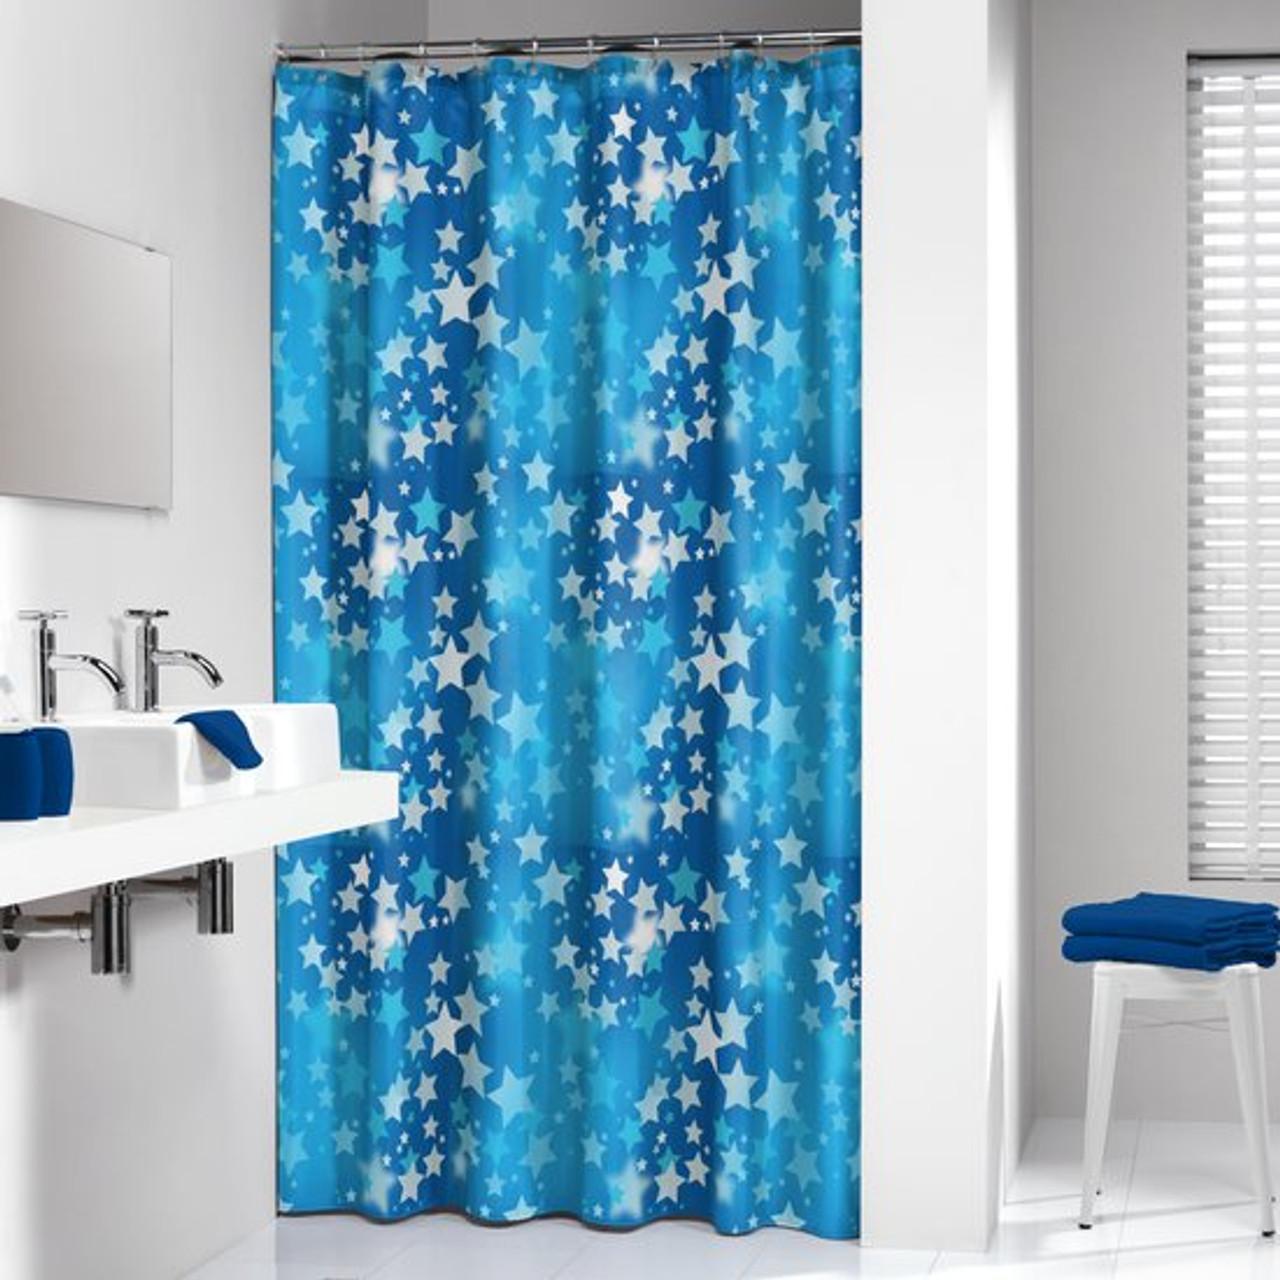 Extra Long Shower Curtain 72 X 78 Inch Sealskin Starry Sky Blue PEVA